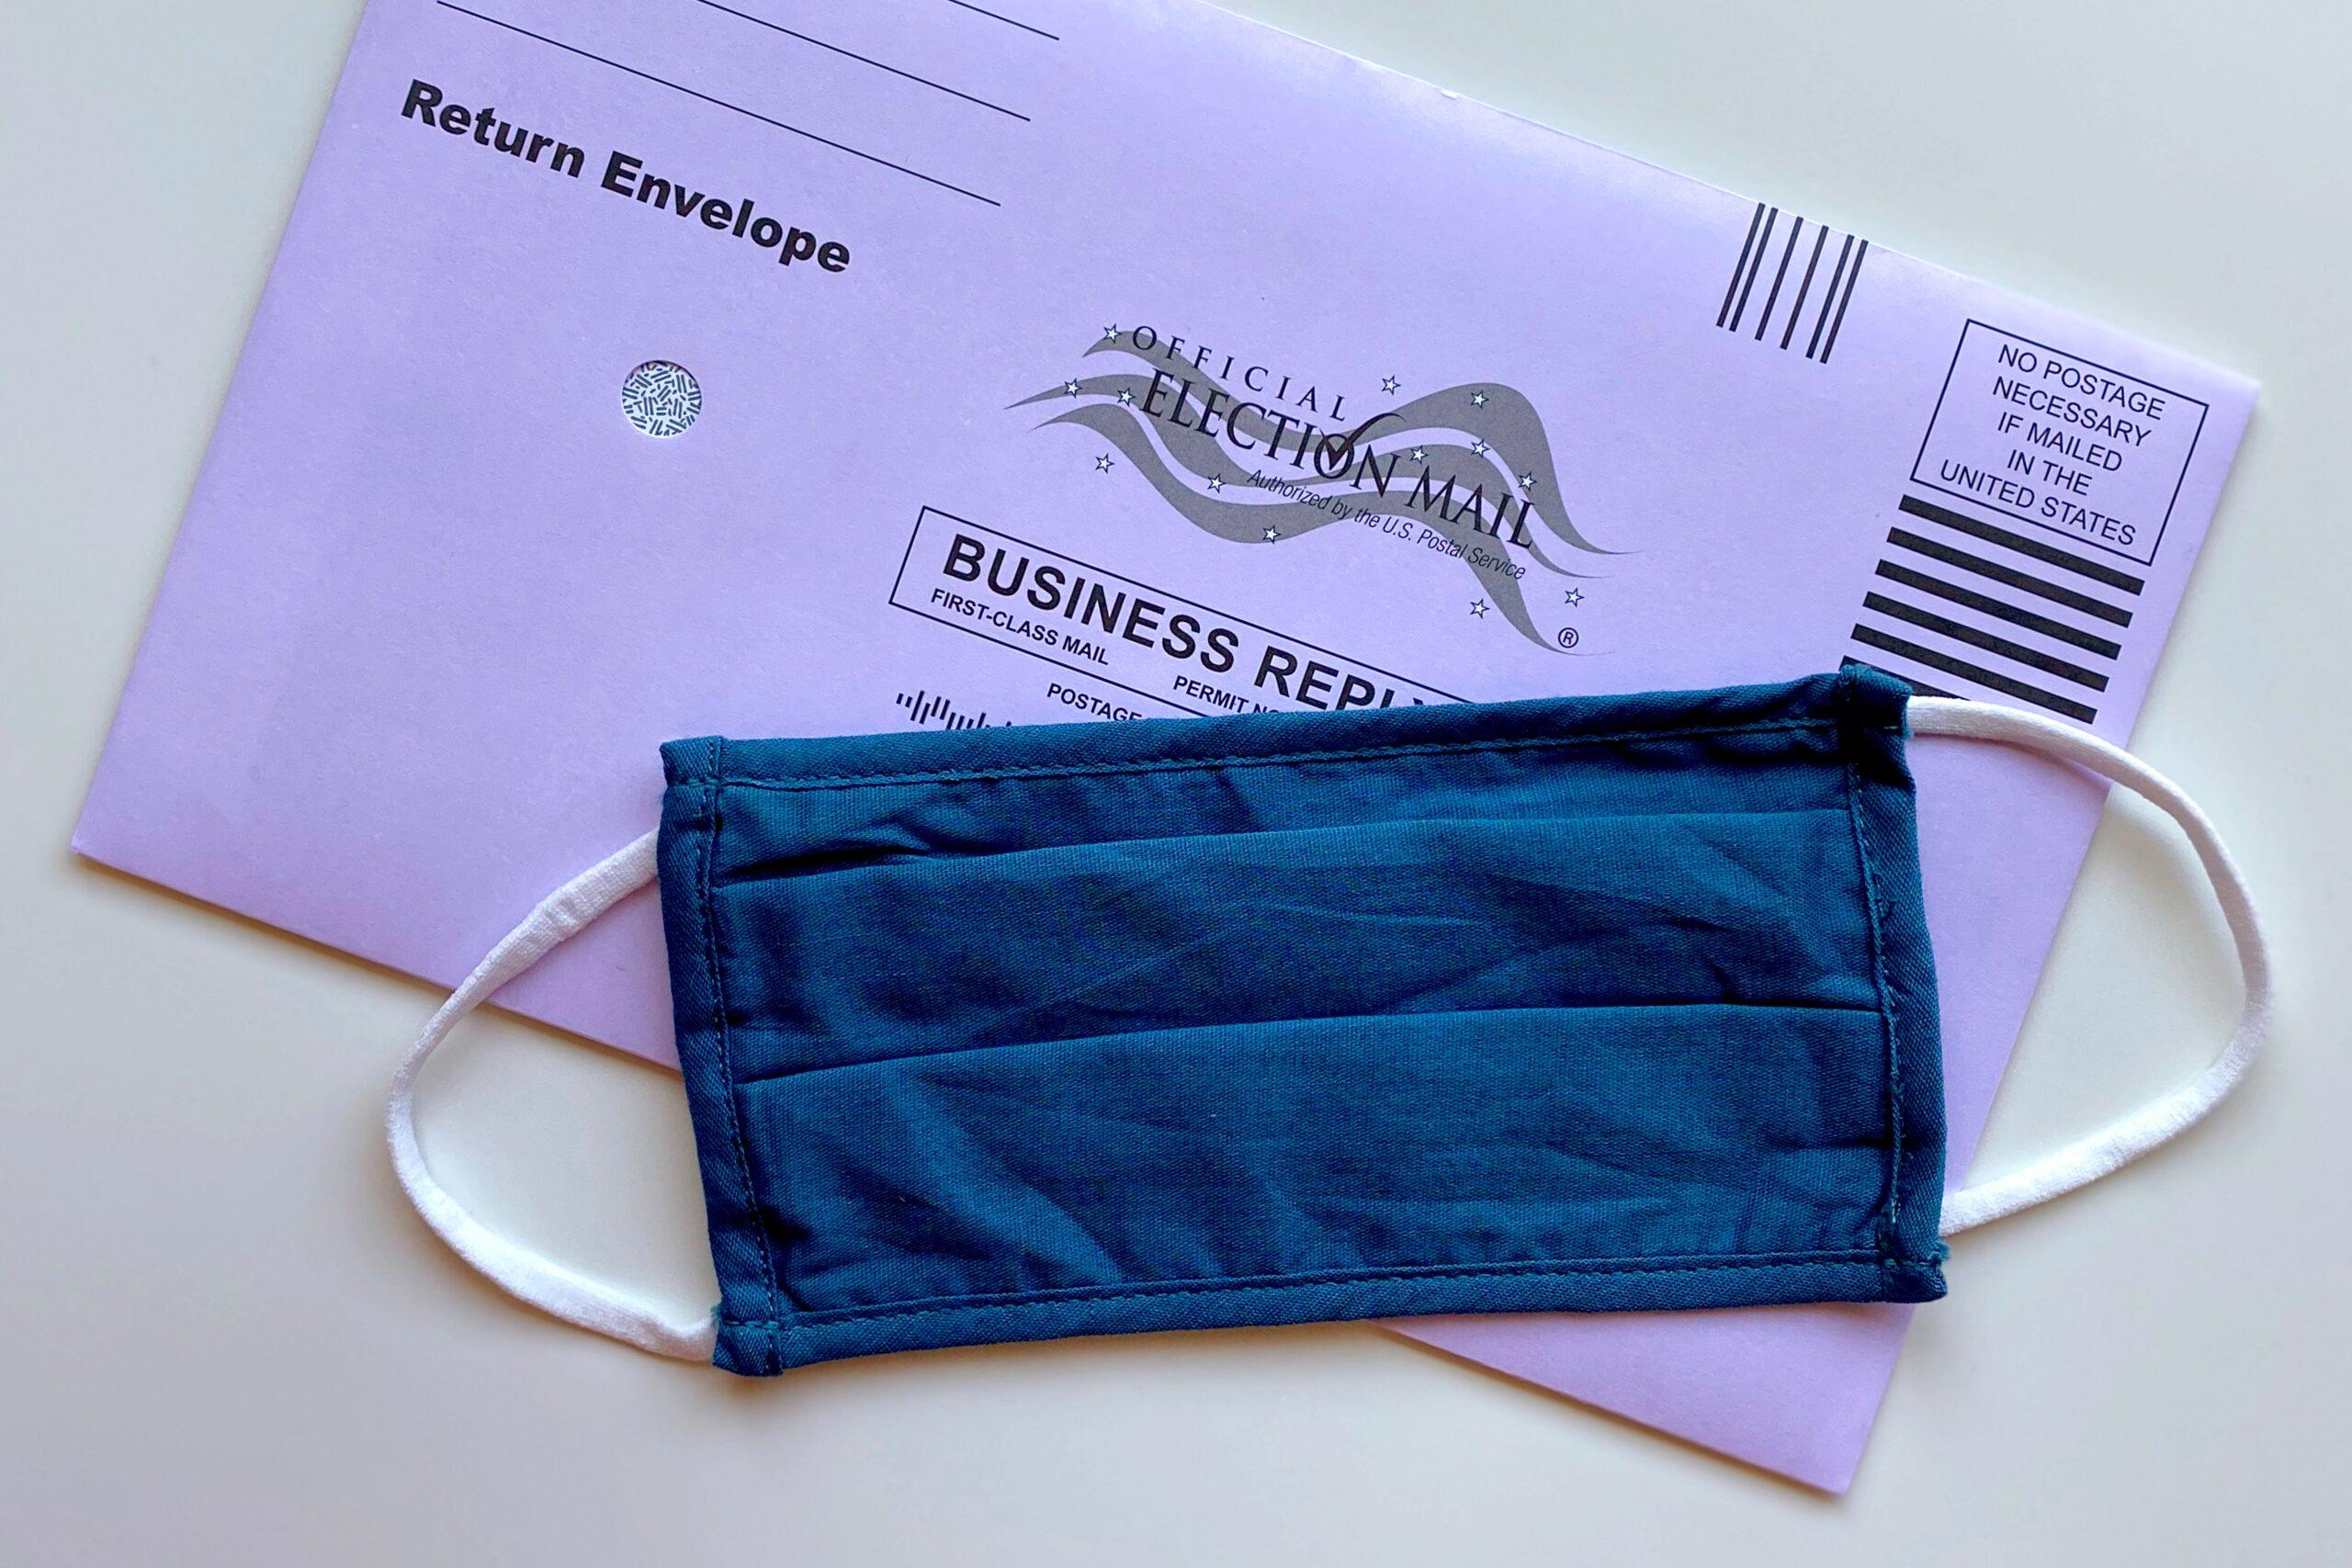 Arizona is prepared to handle mail-in ballots